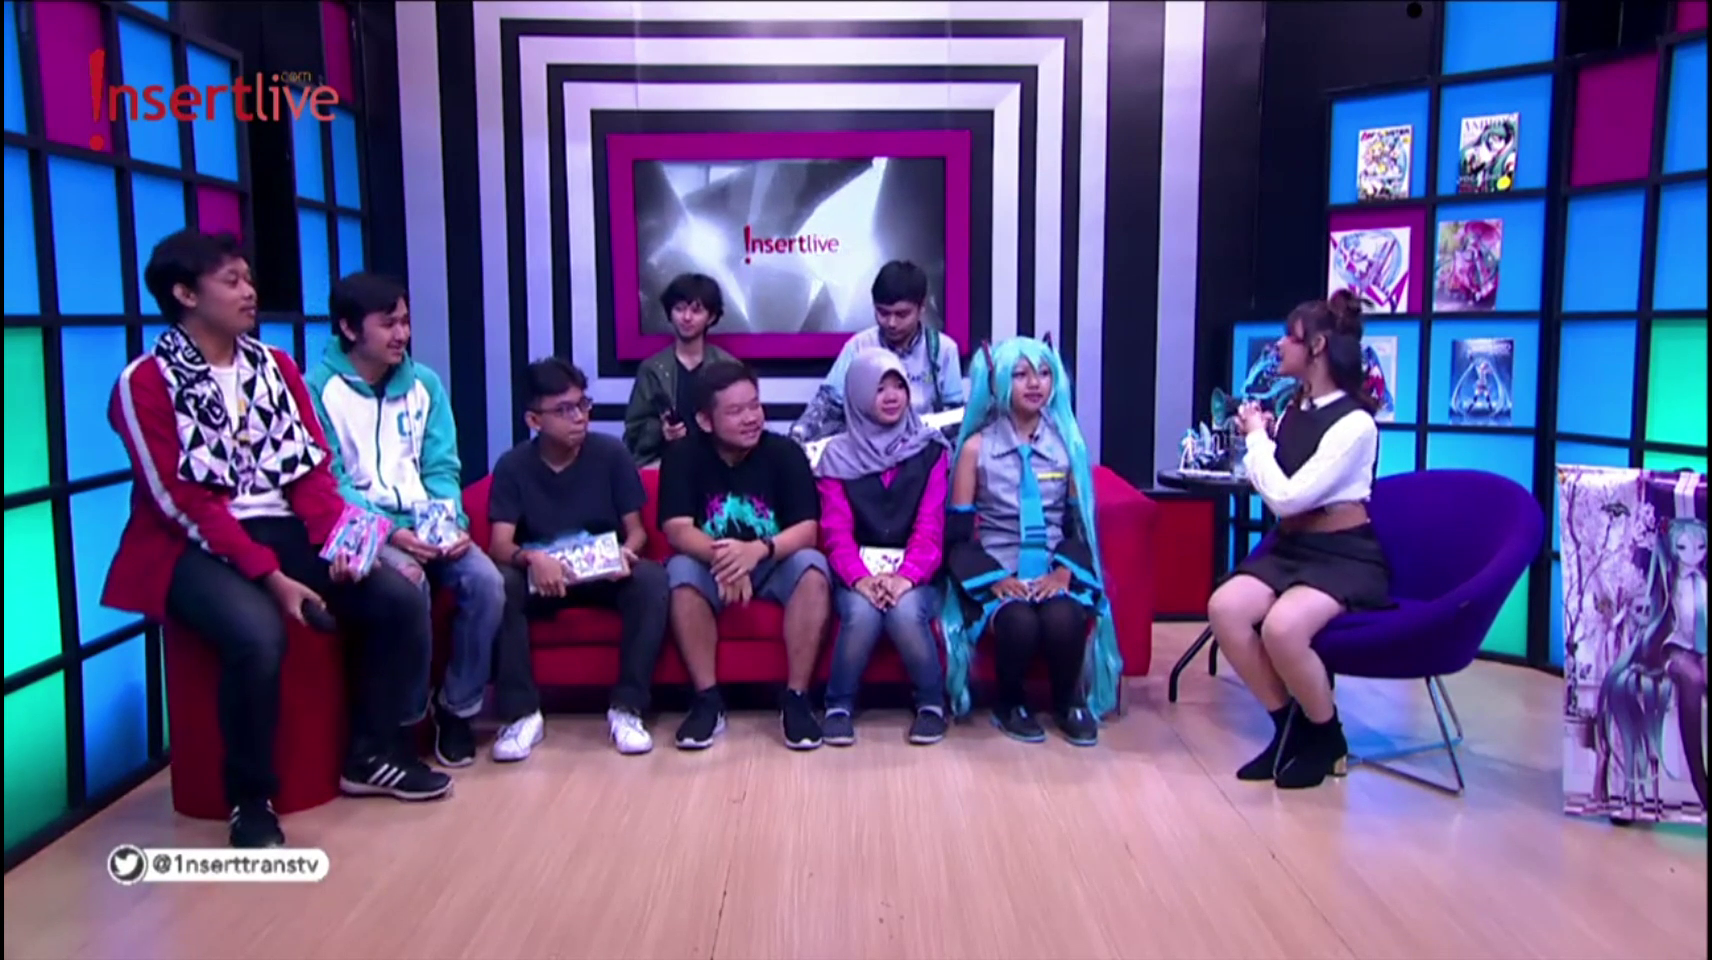 Yuk, Intip Talkshow Interaktif Insert J-Pop Terkait Dunia Vocaloid!